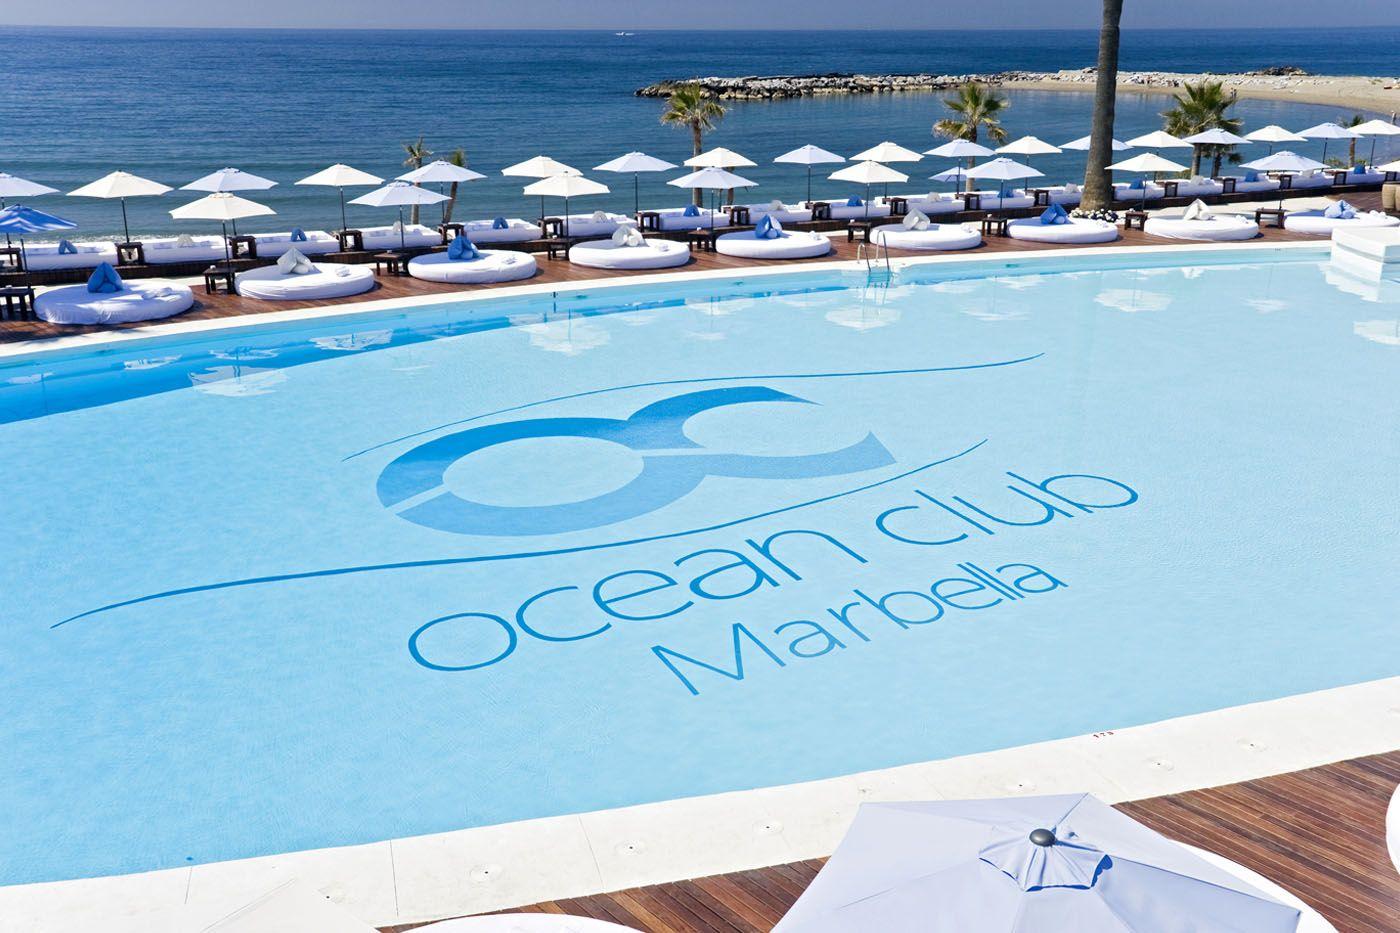 Ocean Club Marbella - The Restaurant | Iberia | Ocean club ...